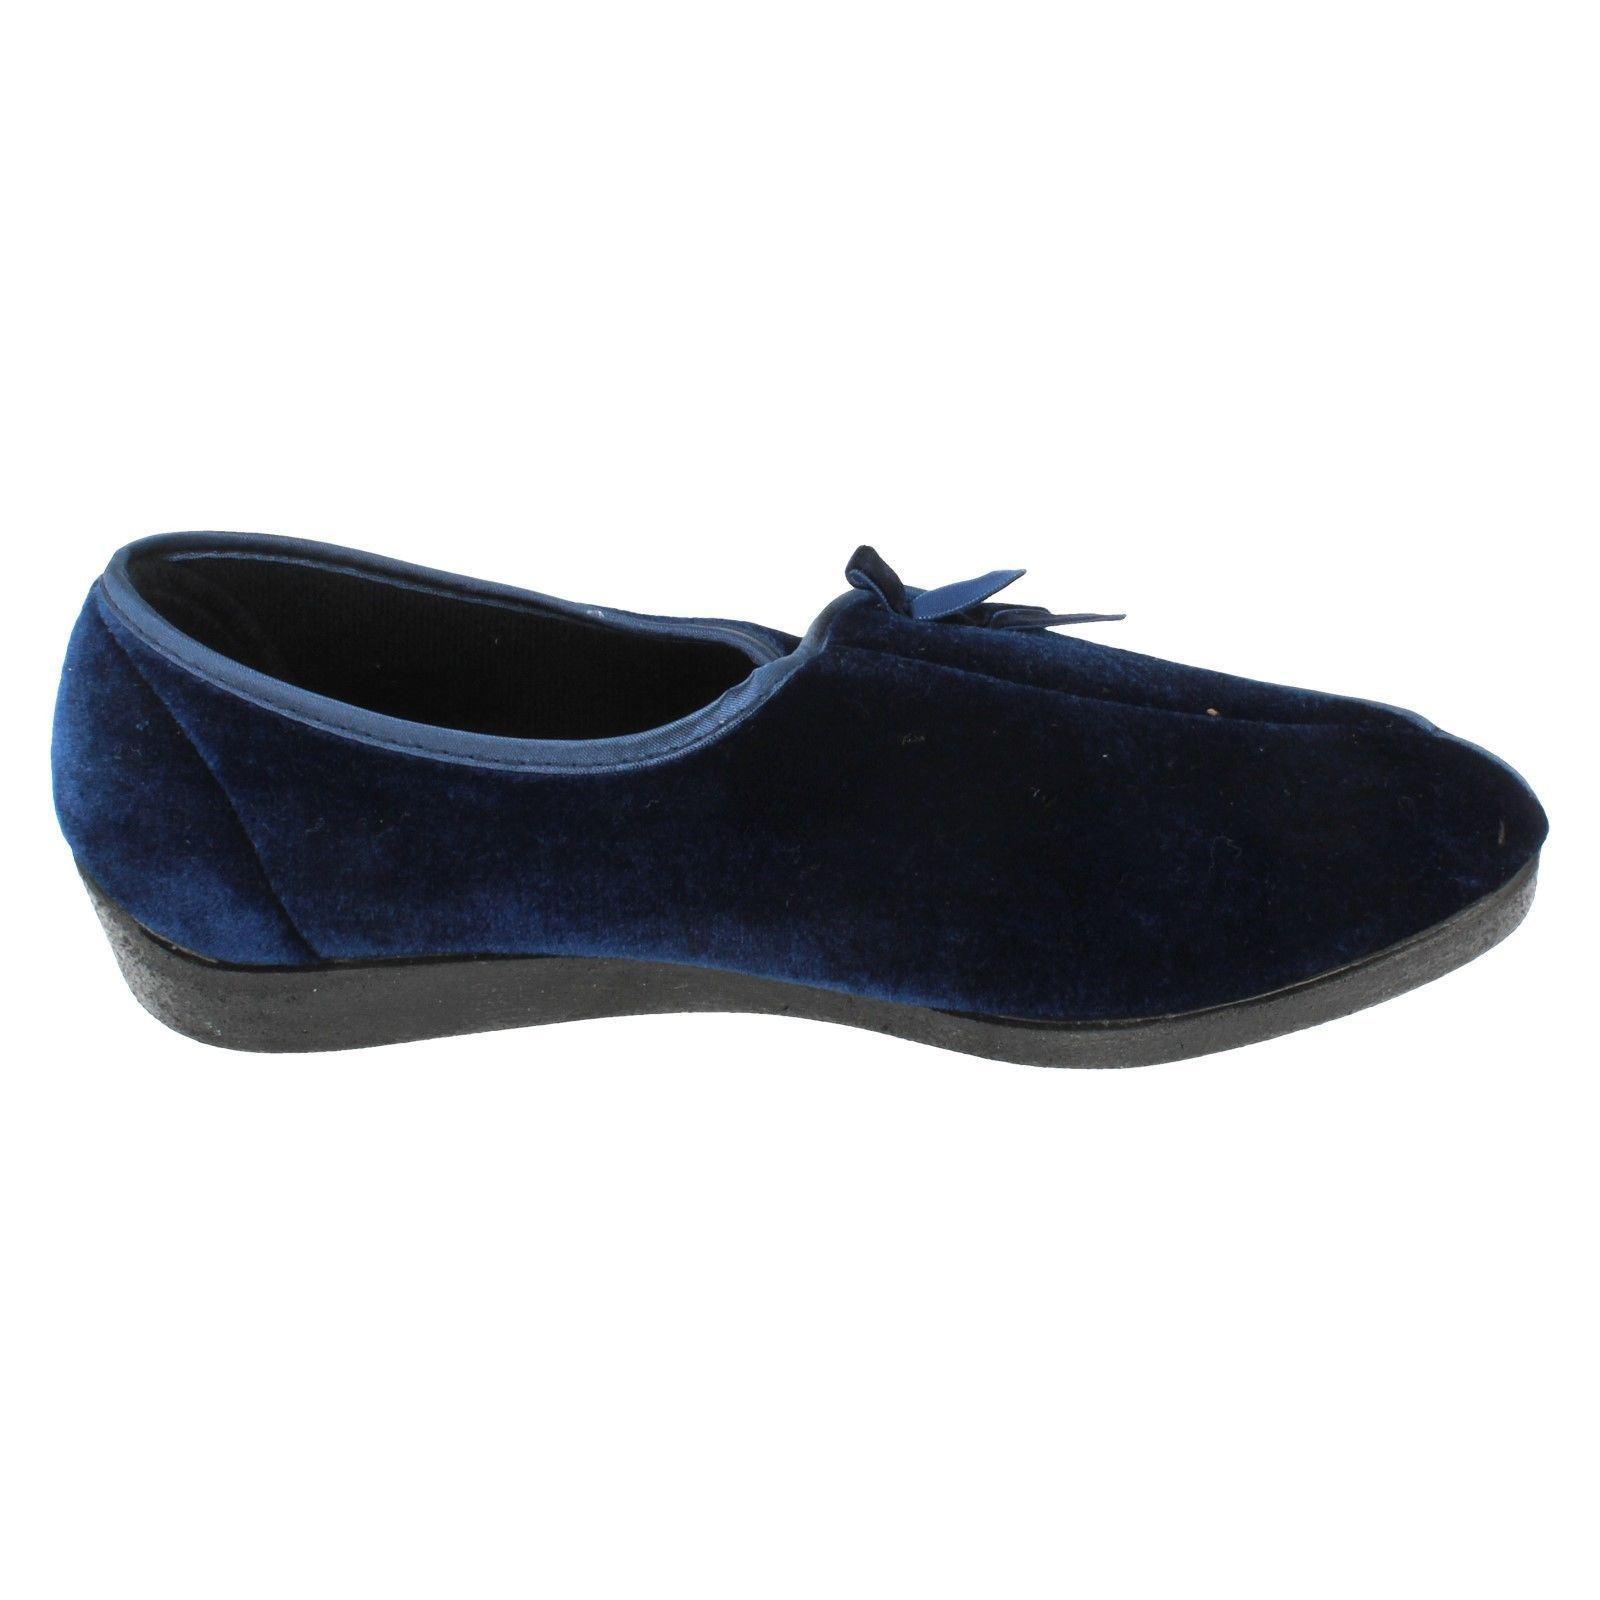 Ladies MARTHA navy wedge slipper by FOUR SEASONS Retail �.99